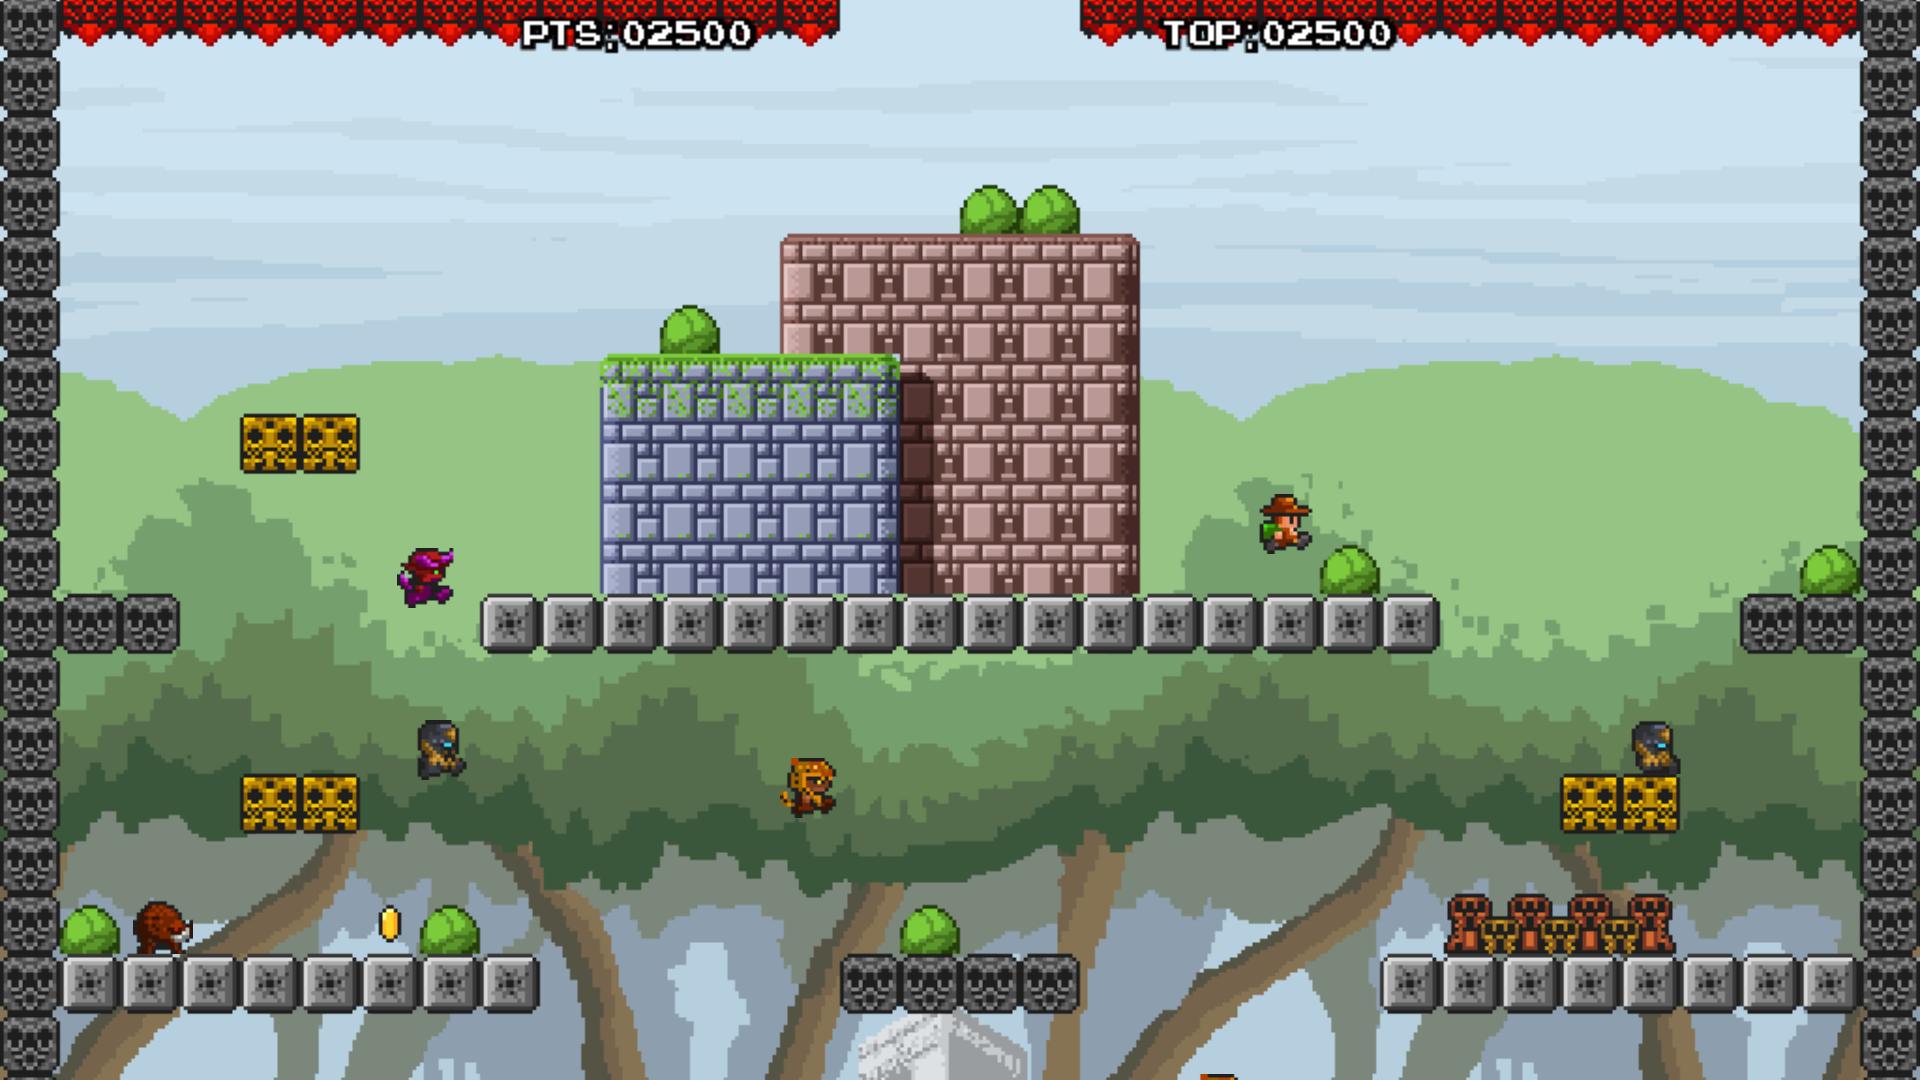 Screenshot 13 of 14